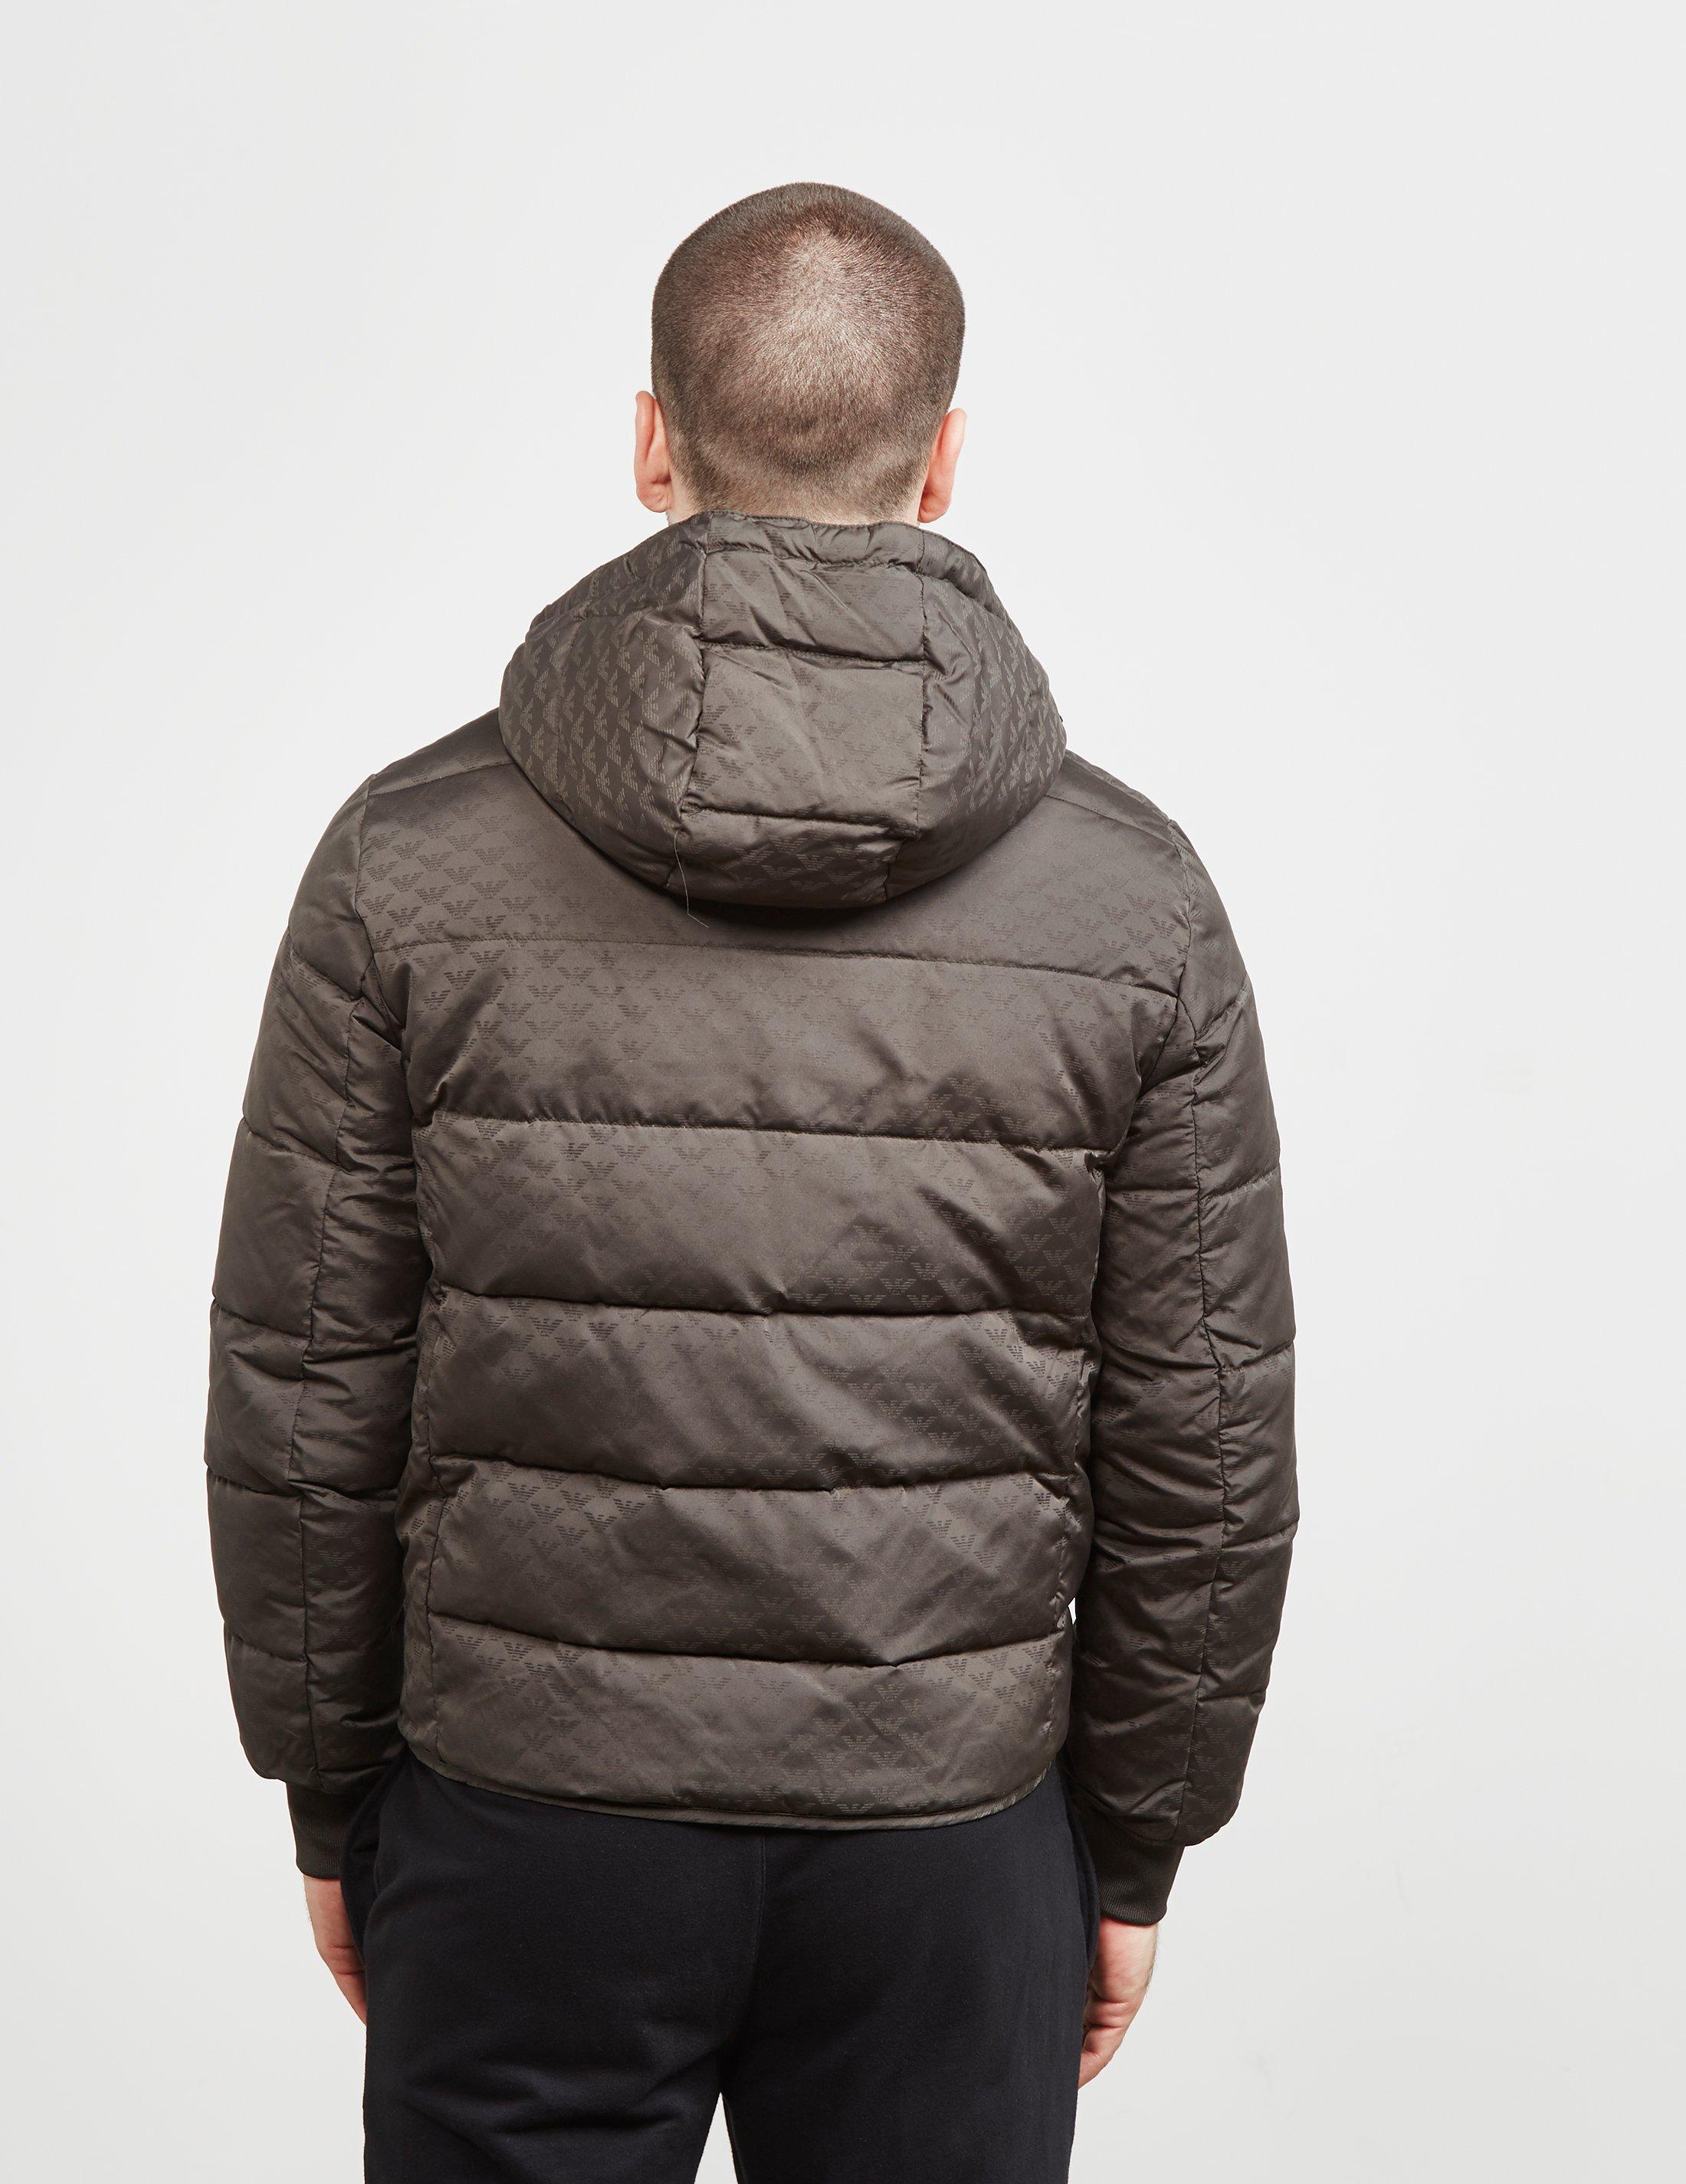 b110a7c85028 Emporio Armani Mens Eagle Print Down Padded Jacket Khaki khaki in ...